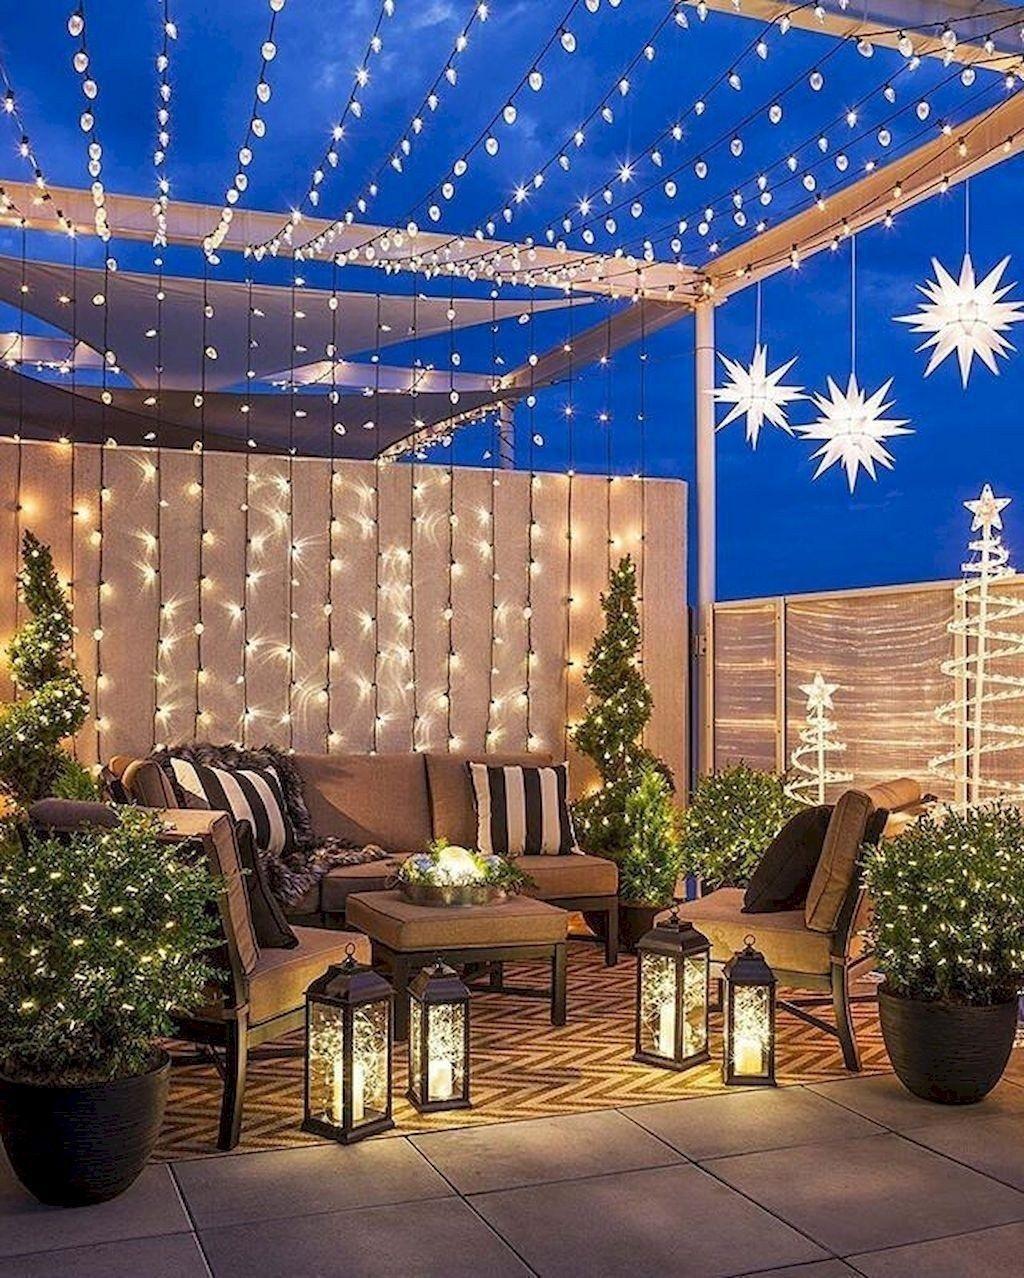 Adorable Diy Light Design Ideas For Stunning Home Outdoor 35